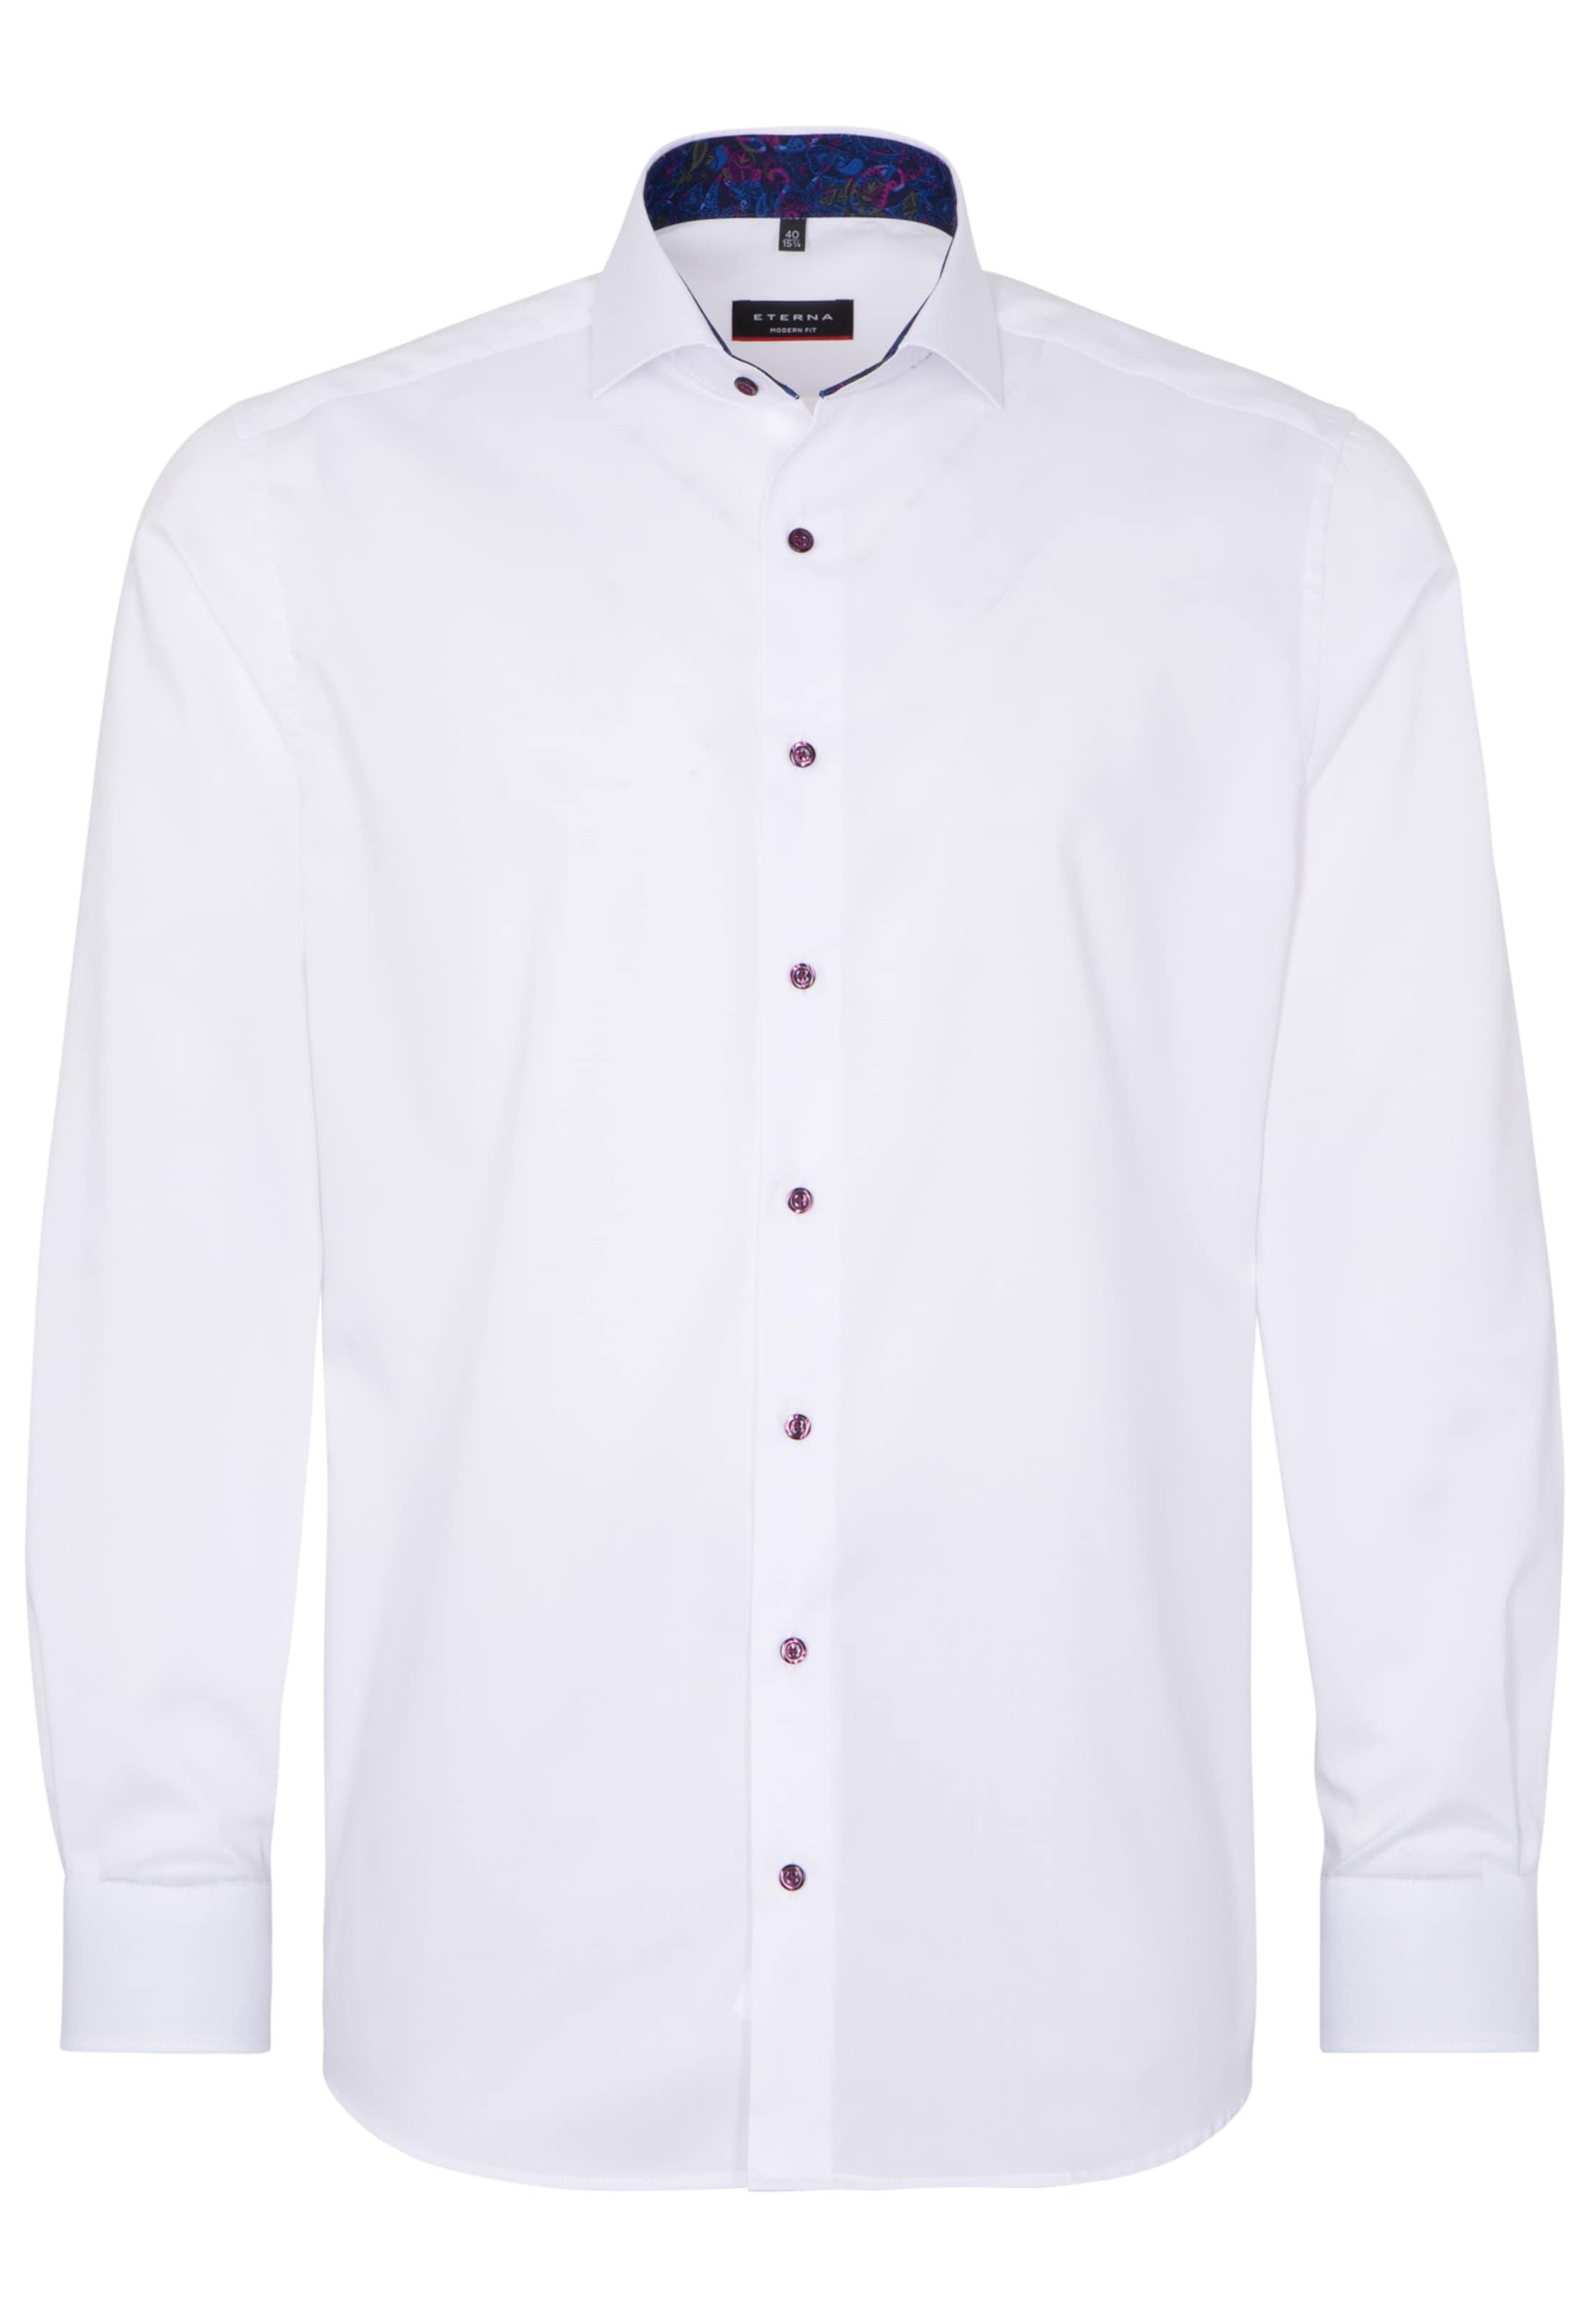 Weiß Hemd In Eterna Eterna Hemd Hemd Weiß In Eterna Hemd Weiß In Eterna kXZPuiOT